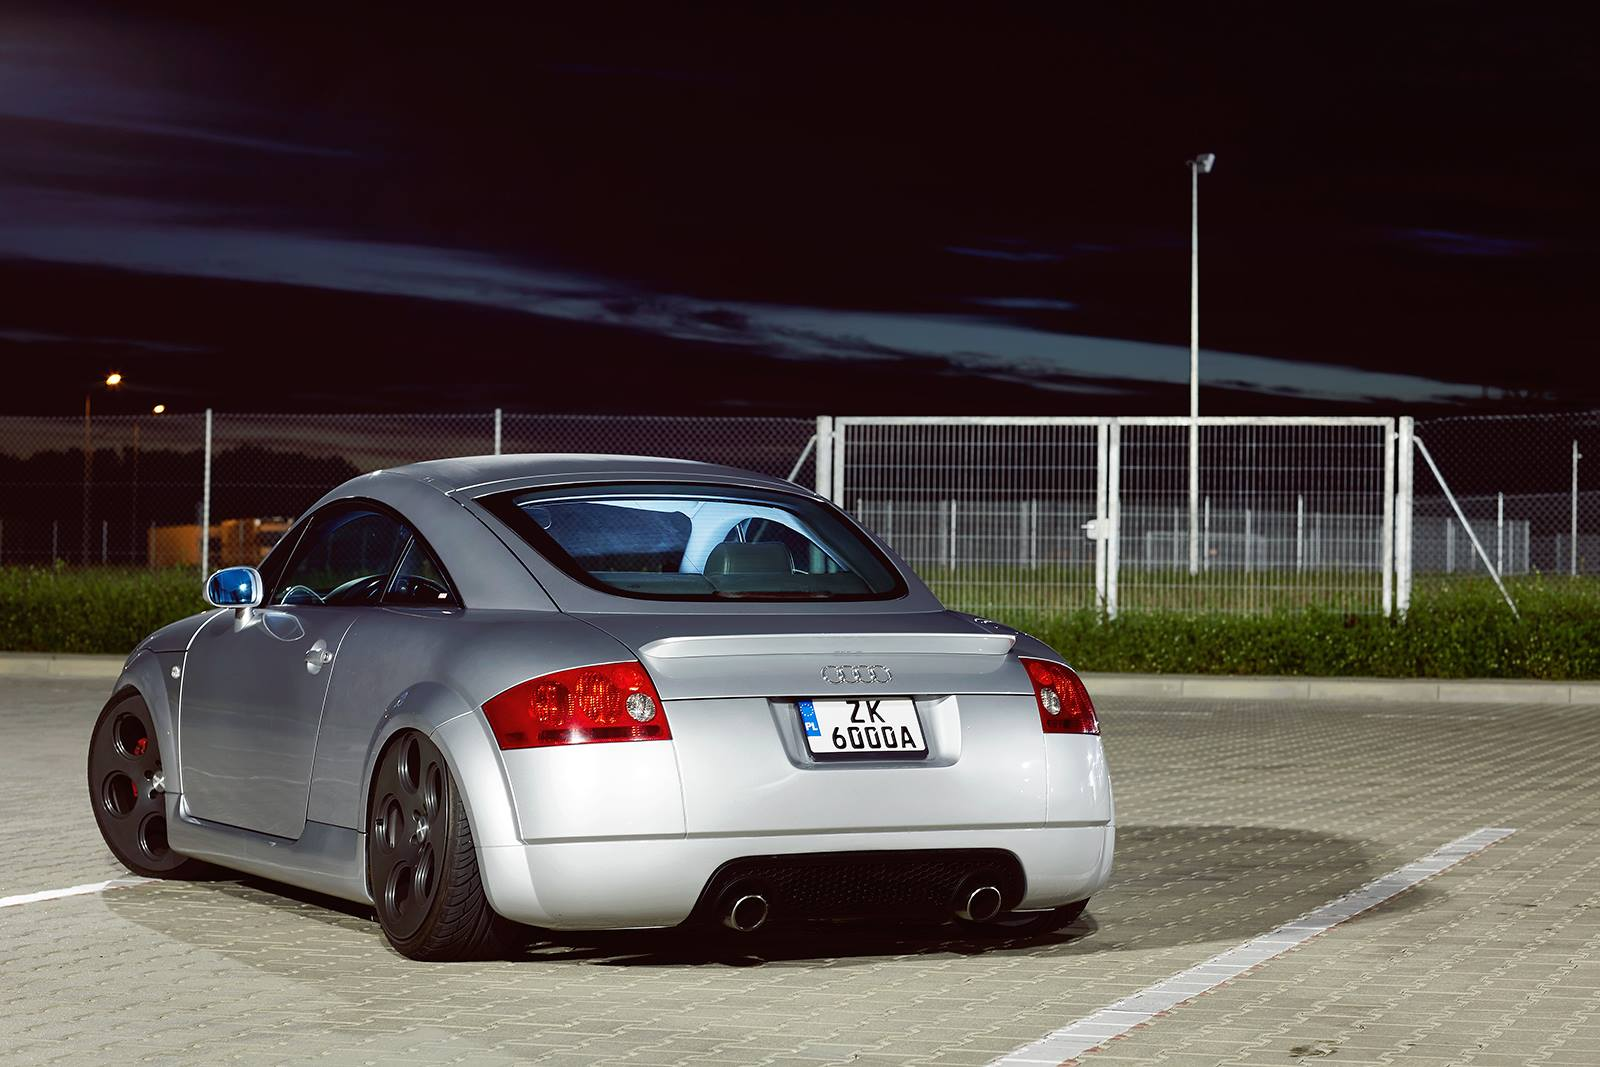 Audi Tt Airride System Mapet Tuning Group